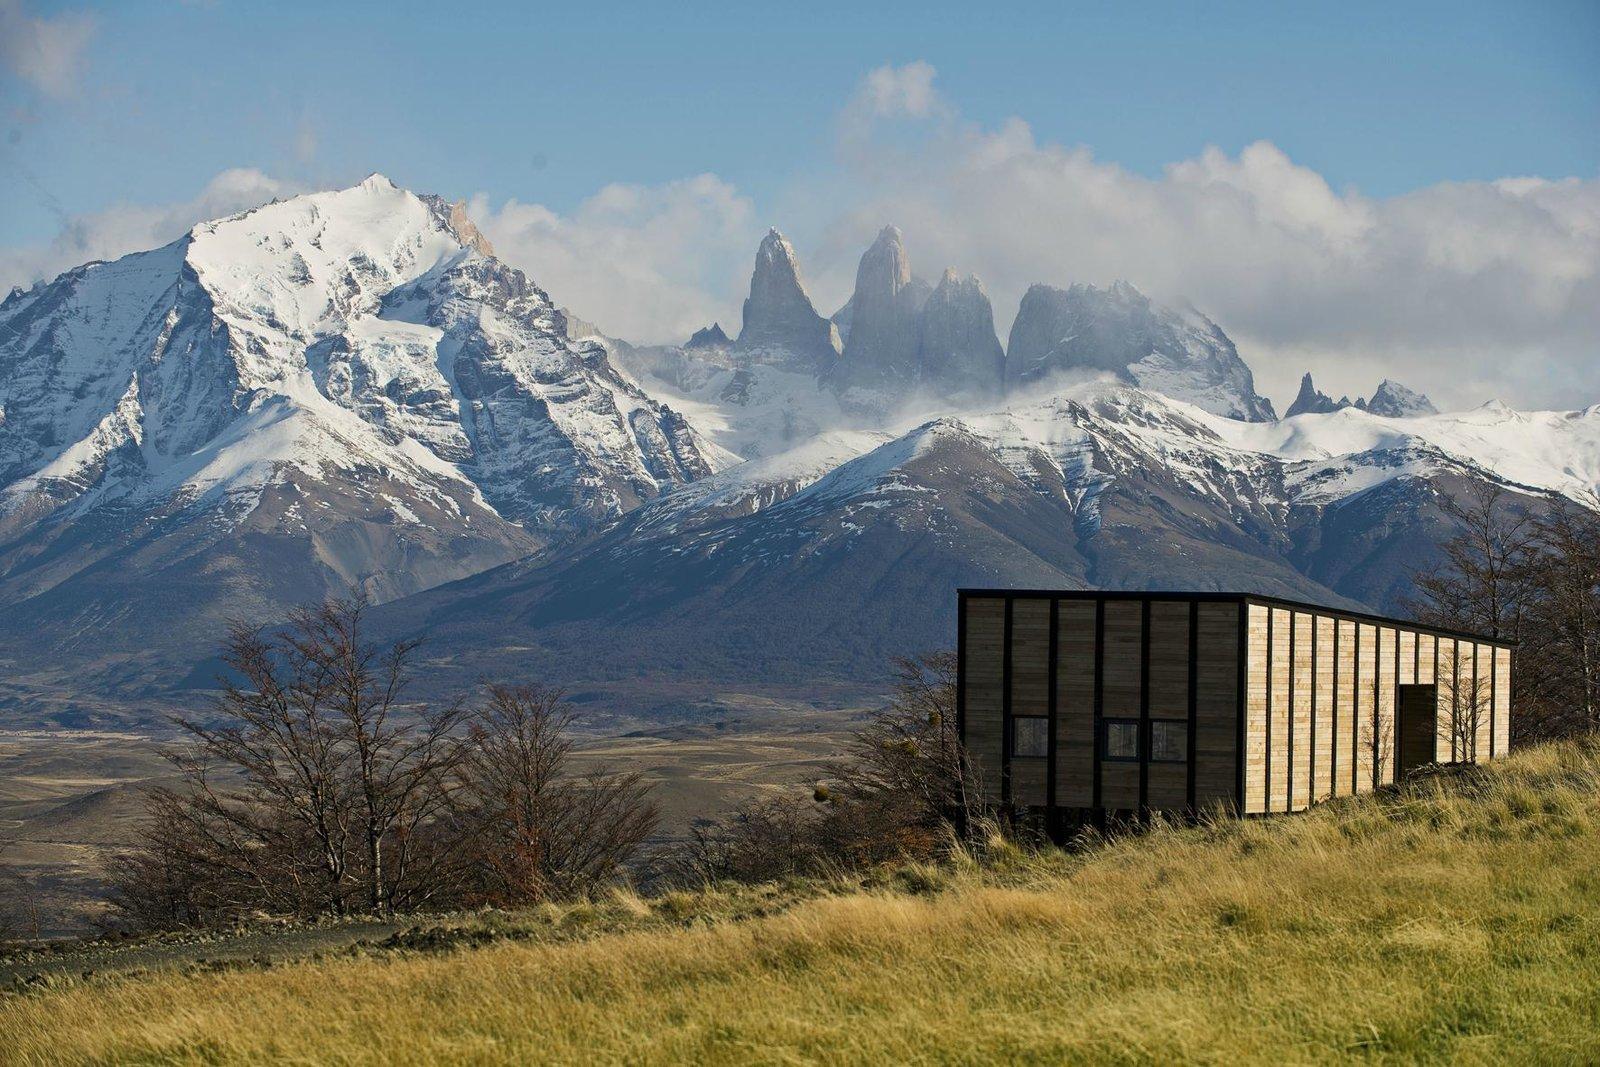 Exterior, Shed RoofLine, and Wood Siding Material  Awasi Patagonia